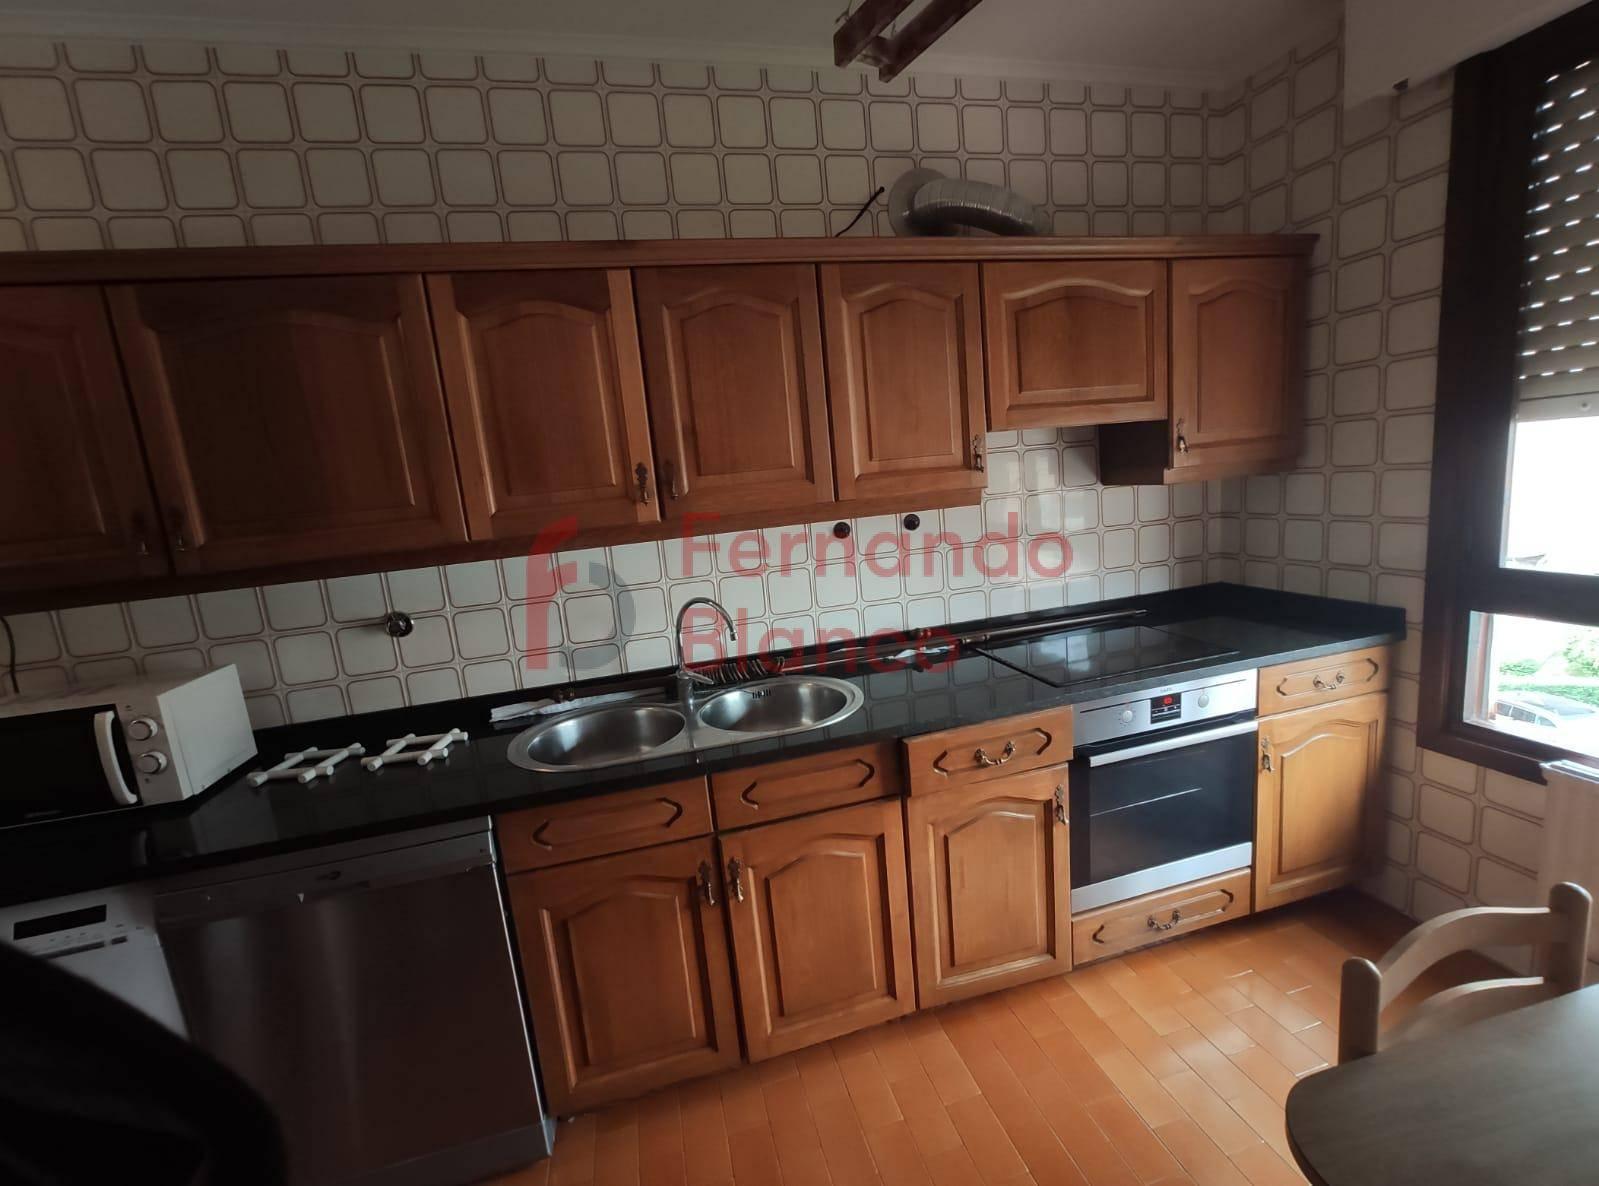 Flat for rent in Algorta, Getxo